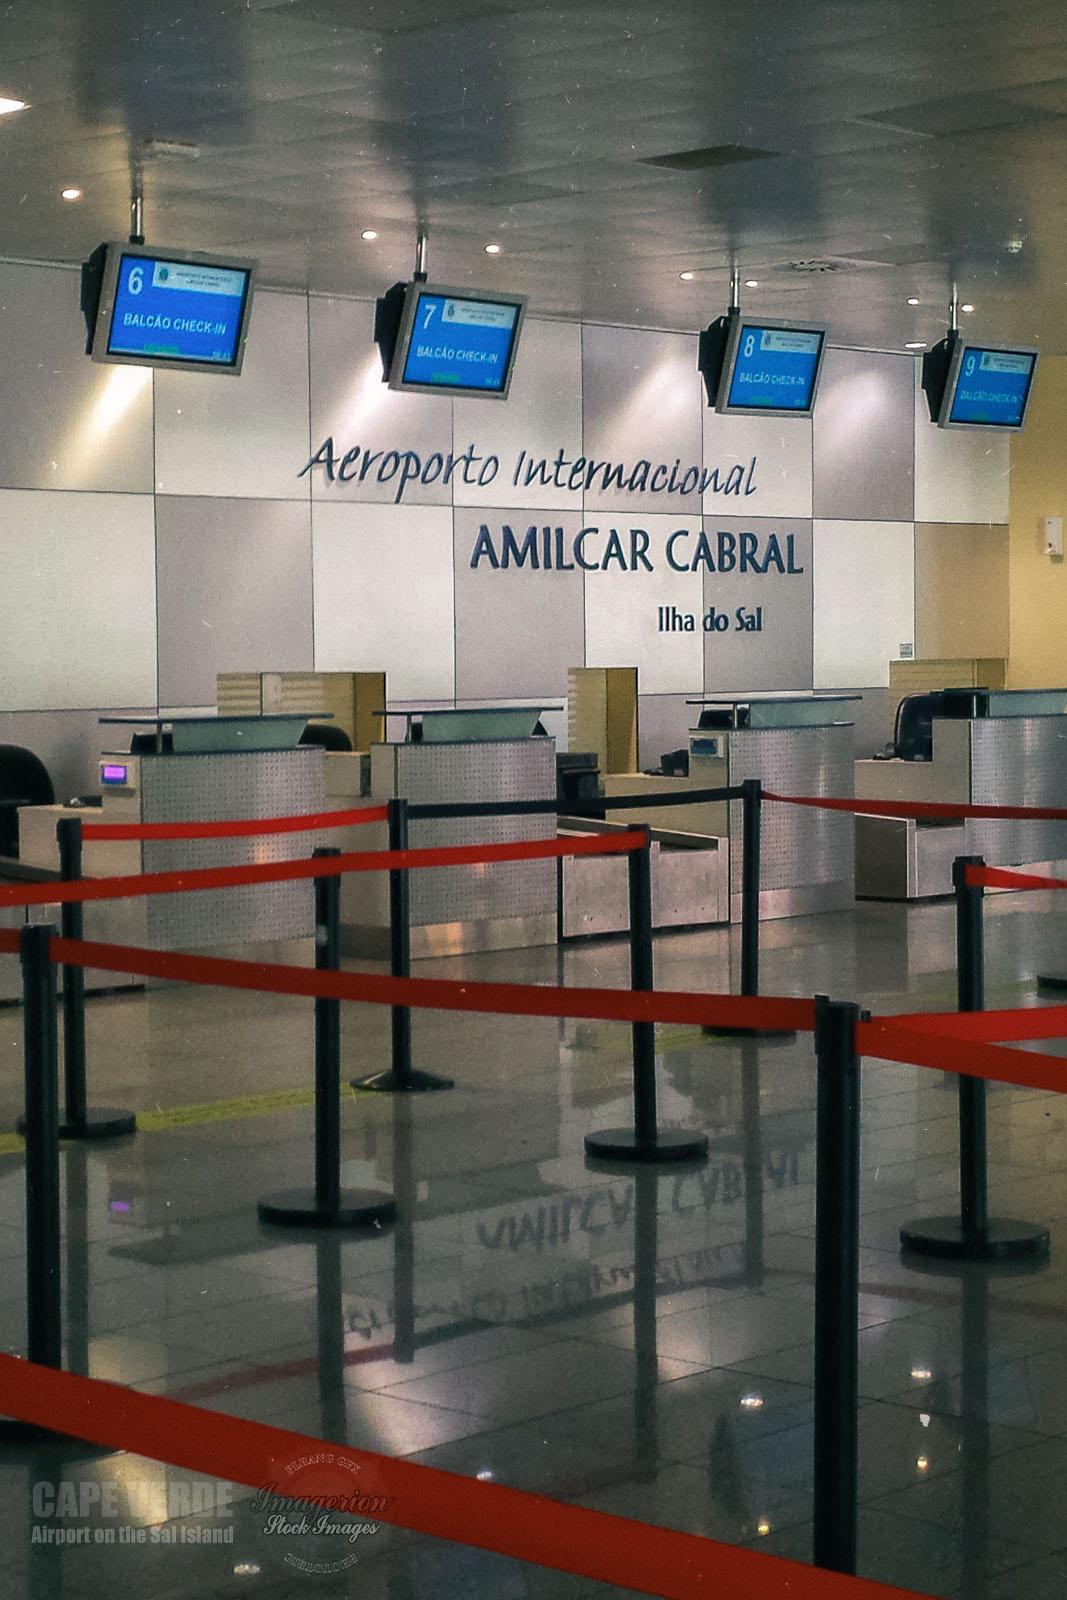 Amilcar Cabral Airport, Cape Verde